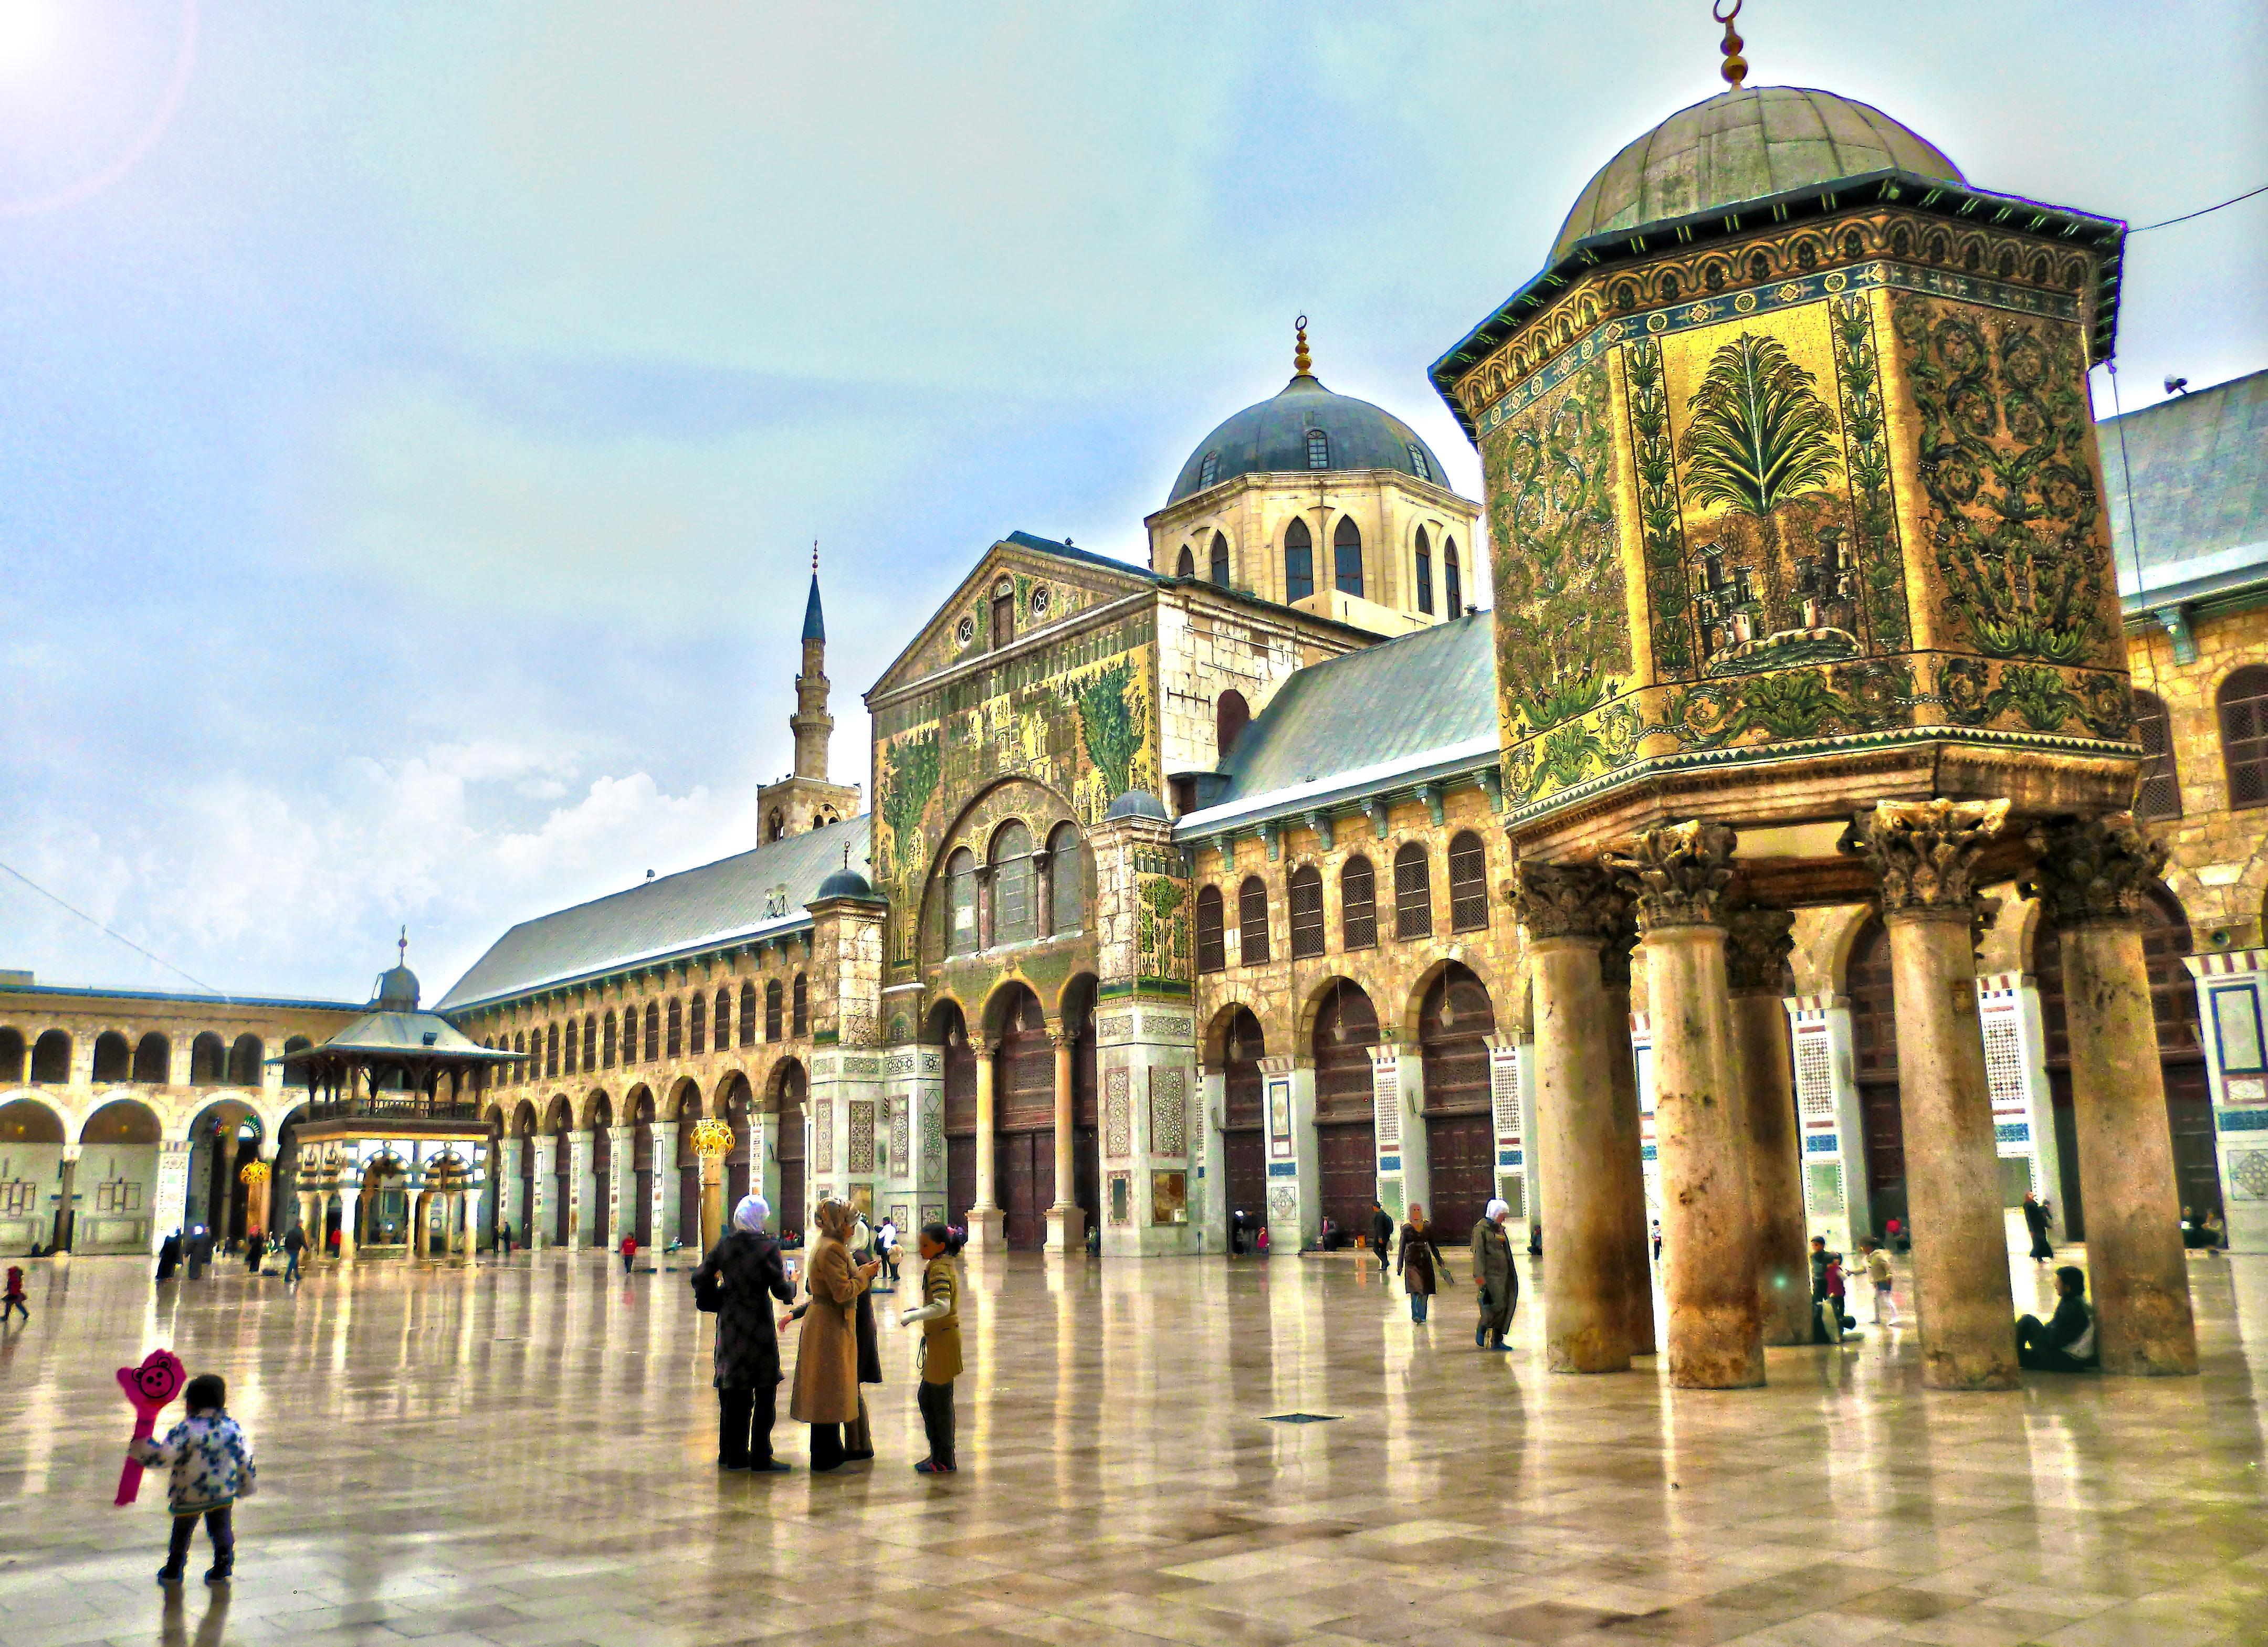 الجامع الاموي في دمشق %D8%A7%D9%84%D8%AC%D8%A7%D9%85%D8%B9-%D8%A7%D9%84%D8%A7%D9%85%D9%88%D9%8A-%D9%81%D9%8A-%D8%AF%D9%85%D8%B4%D9%82